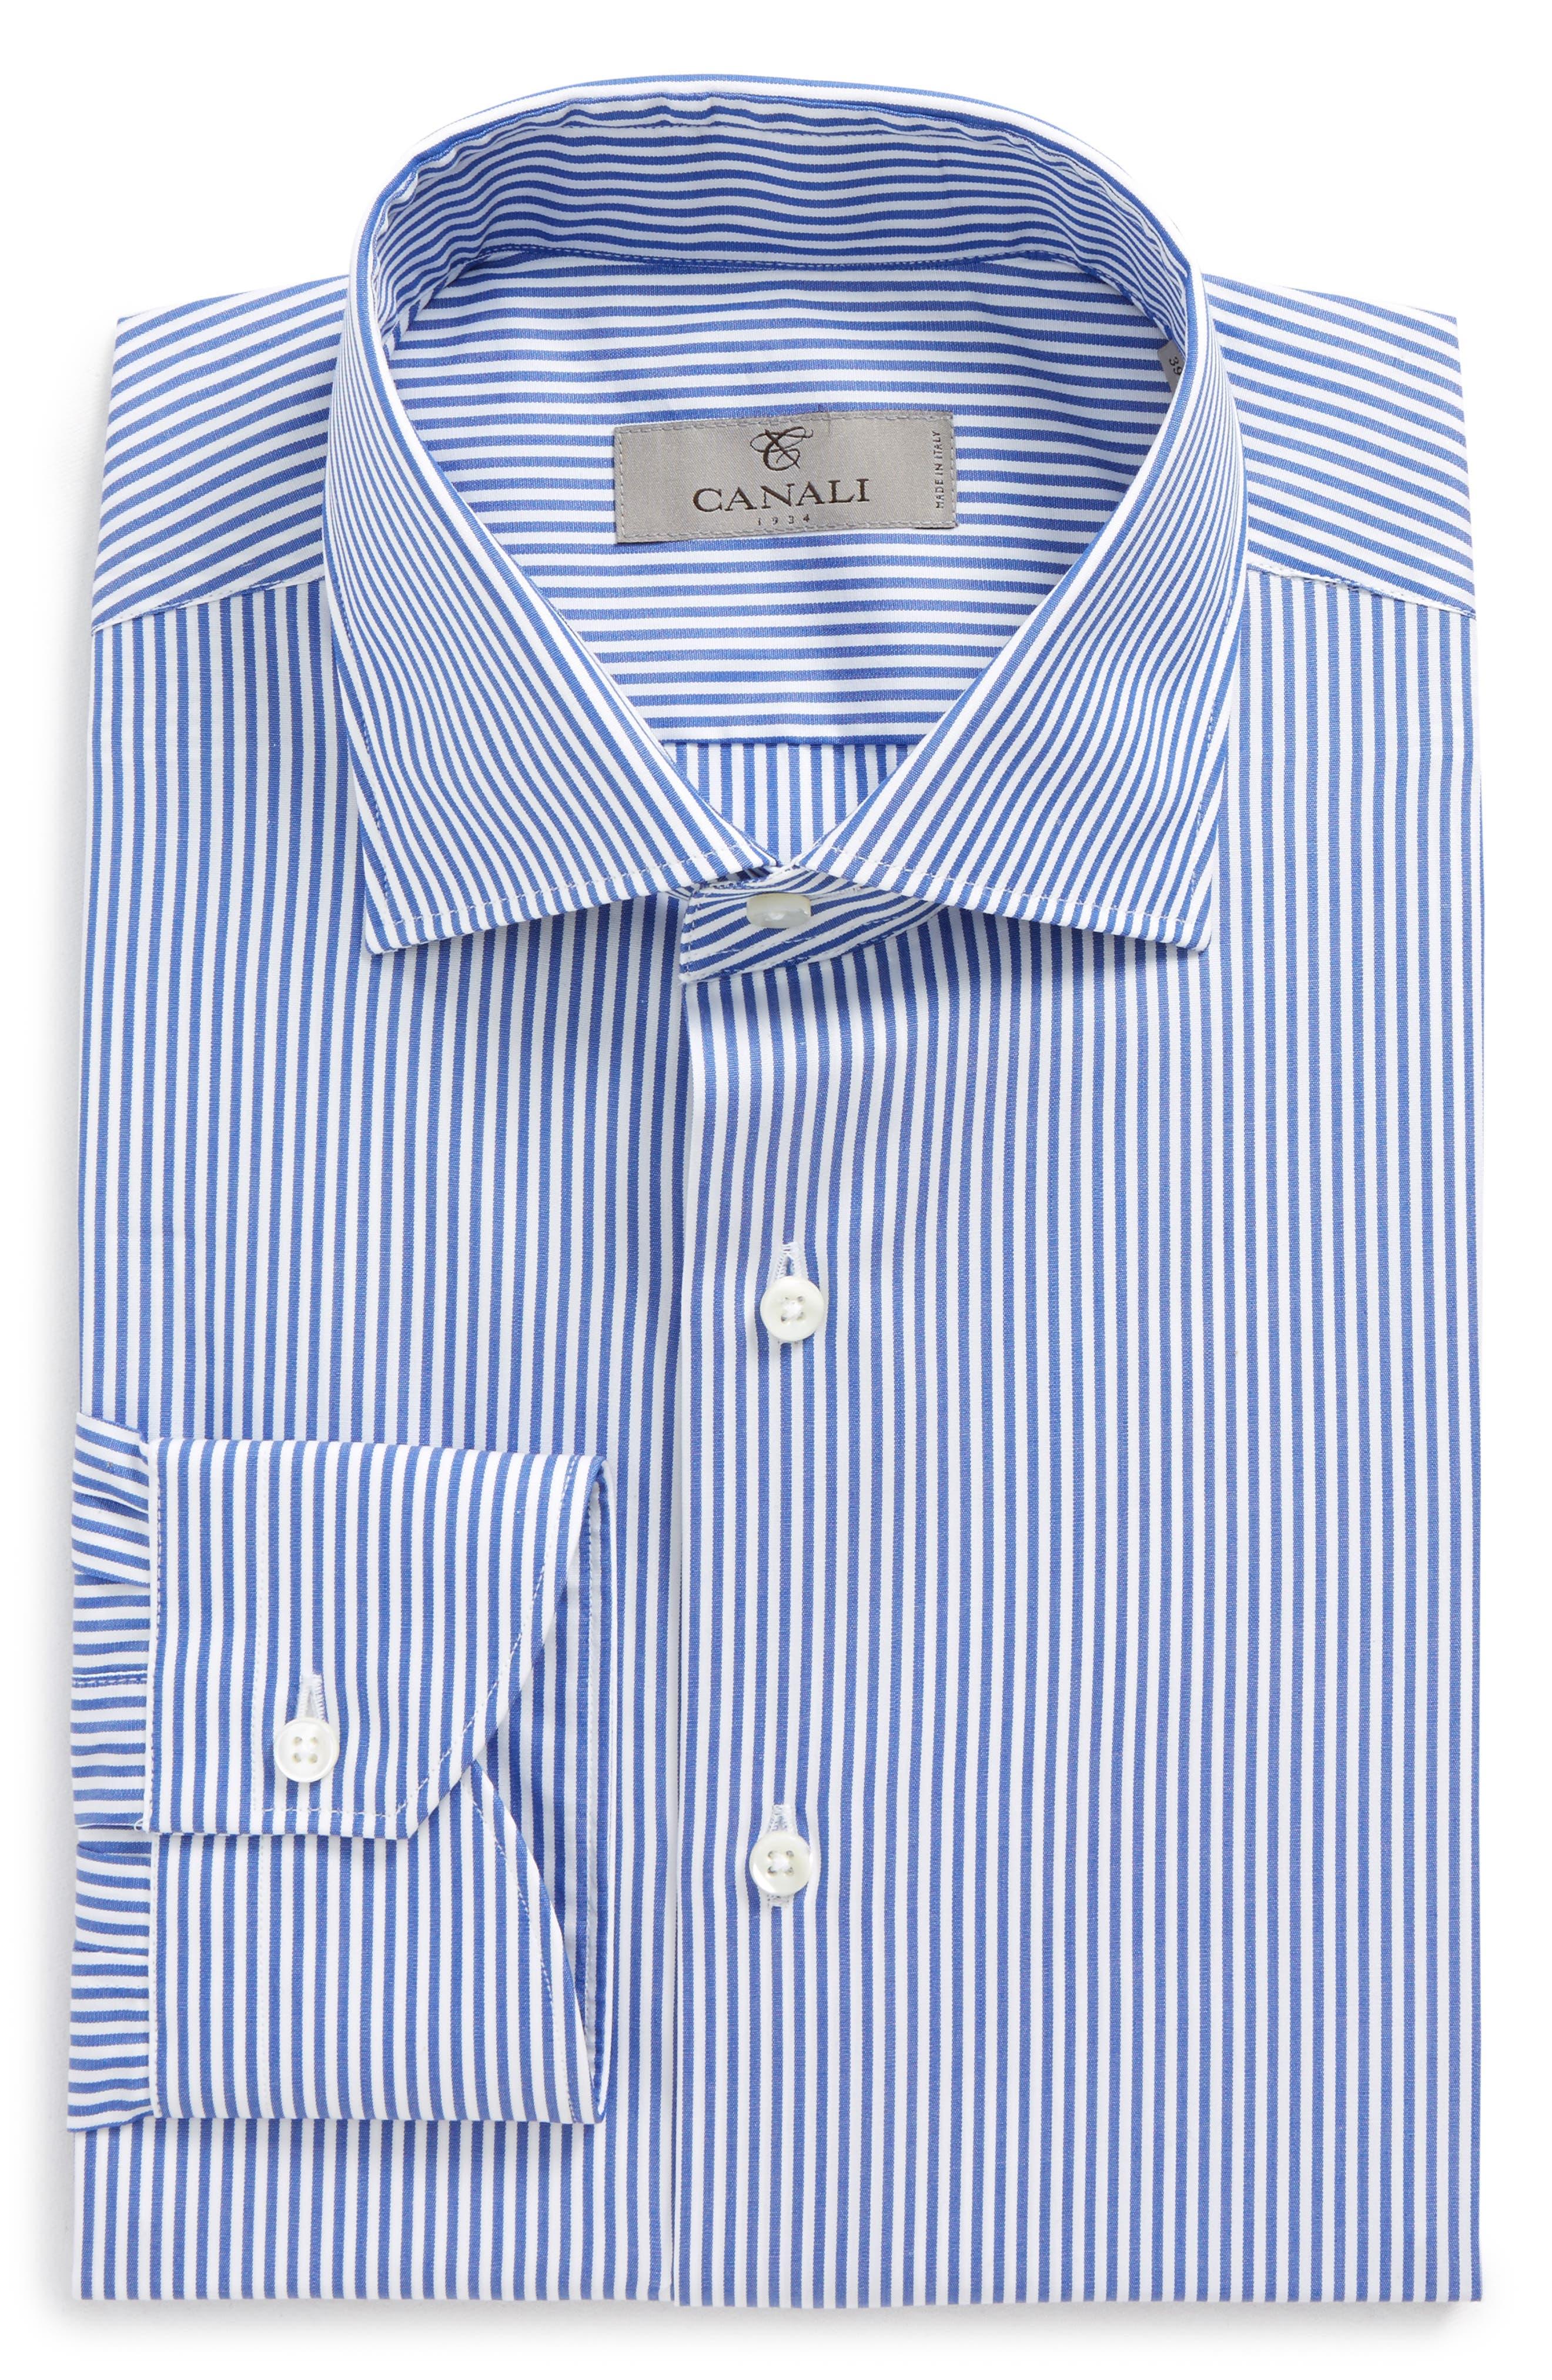 Regular Fit Stripe Dress Shirt,                         Main,                         color, 410